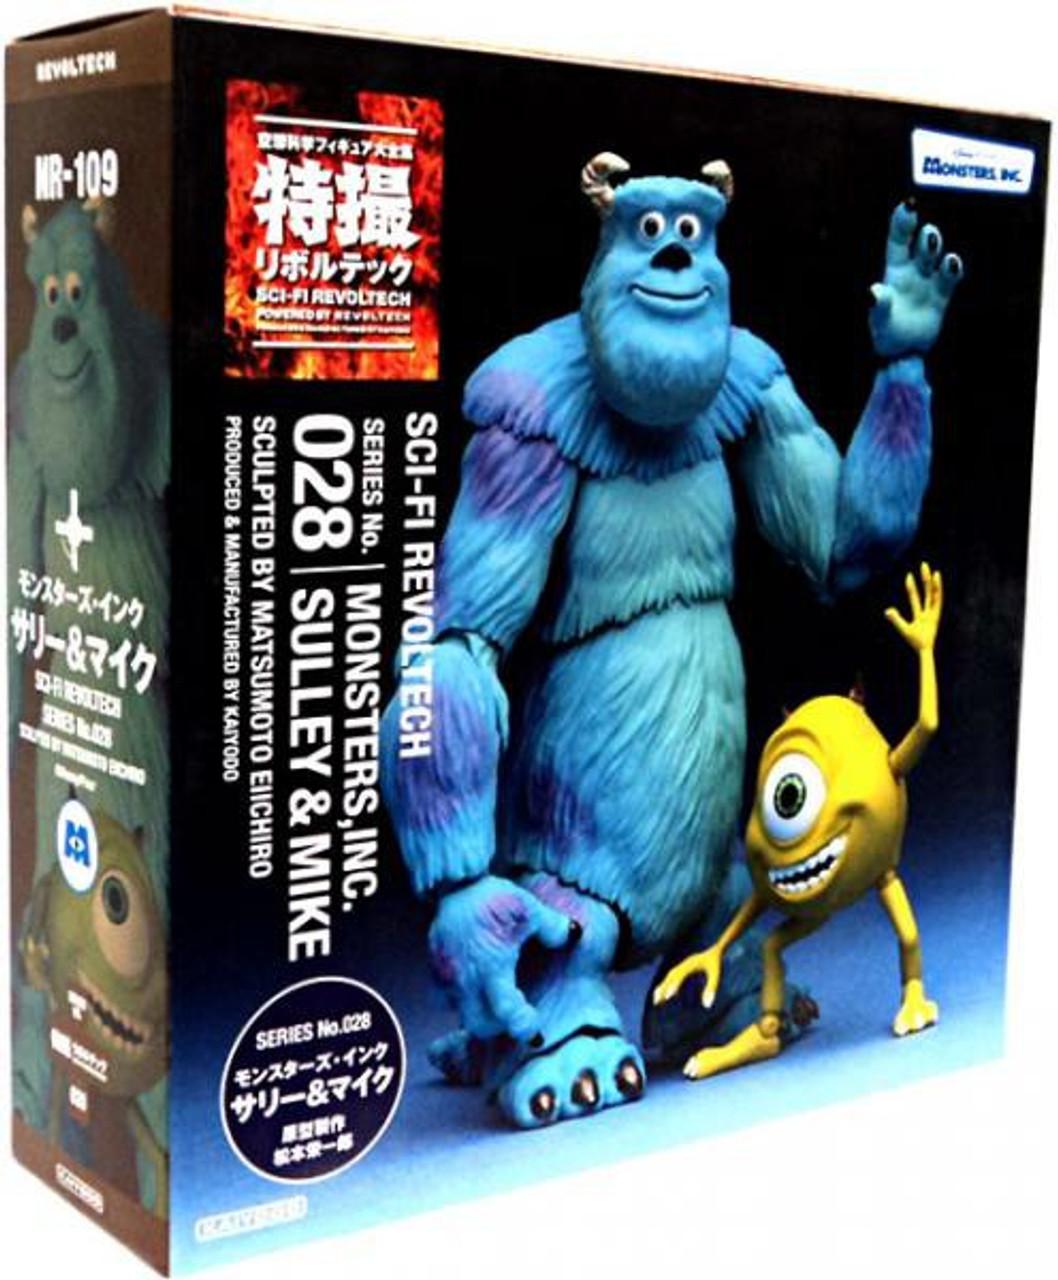 Disney / Pixar Monsters Inc Revoltech Sulley & Mike Action Figure 2-Pack #028